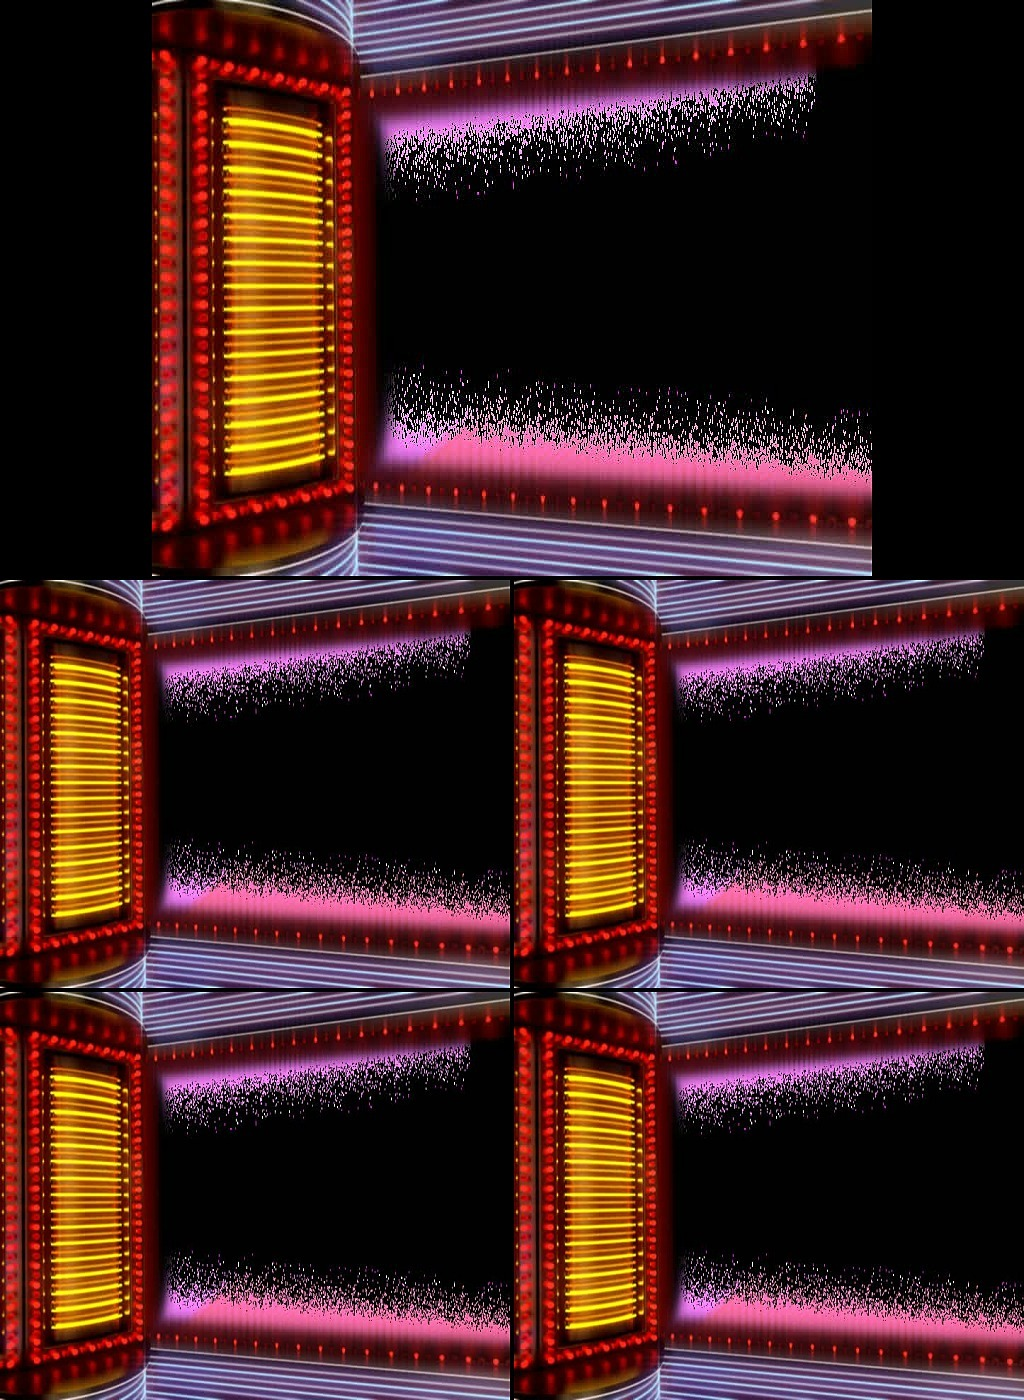 led大屏展示3模板下载(图片